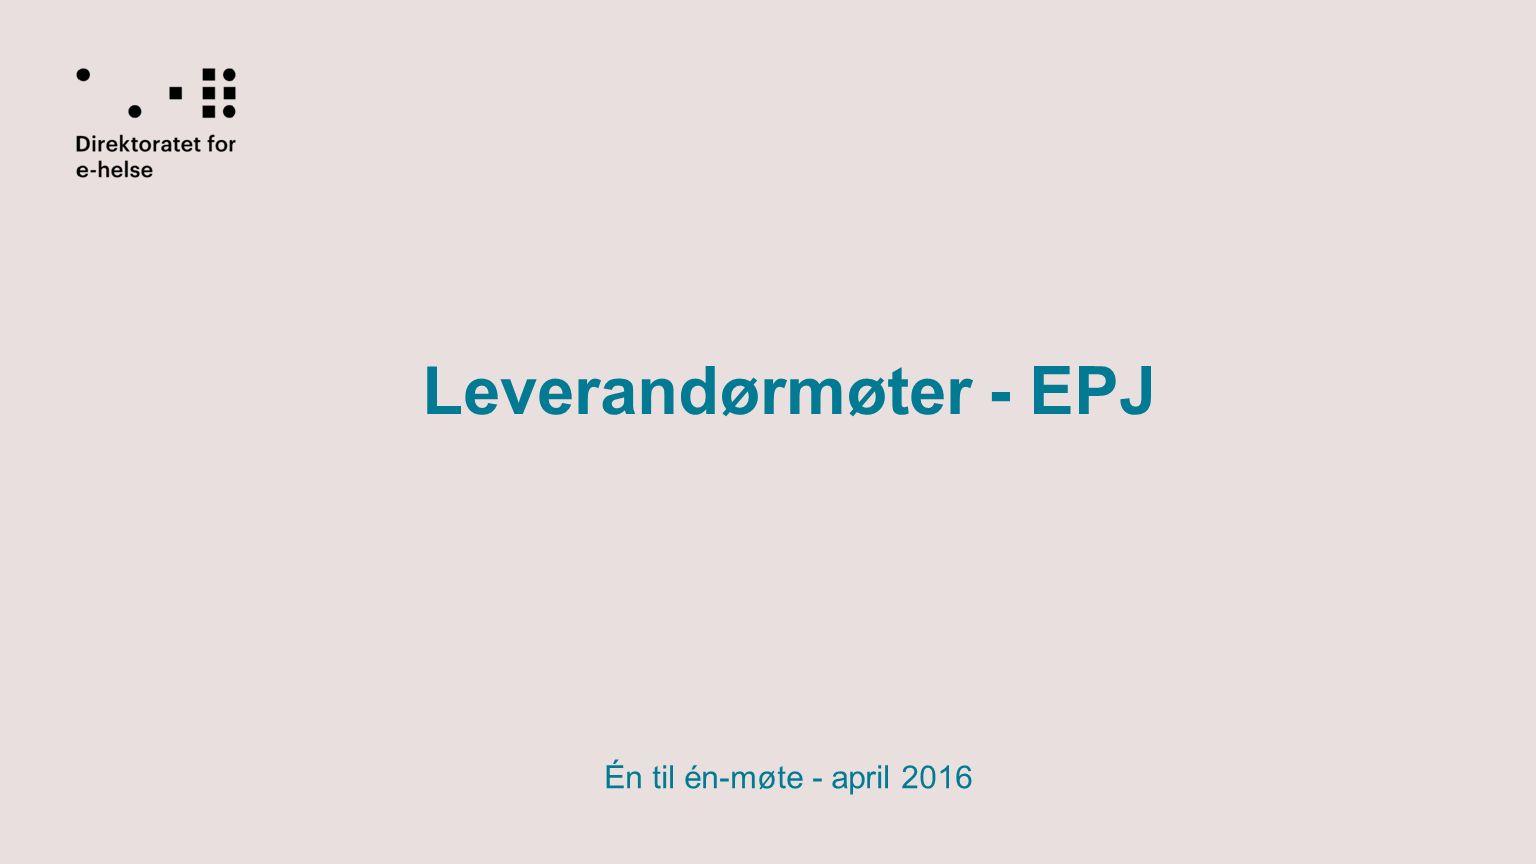 Leverandørmøter - EPJ Én til én-møte - april 2016